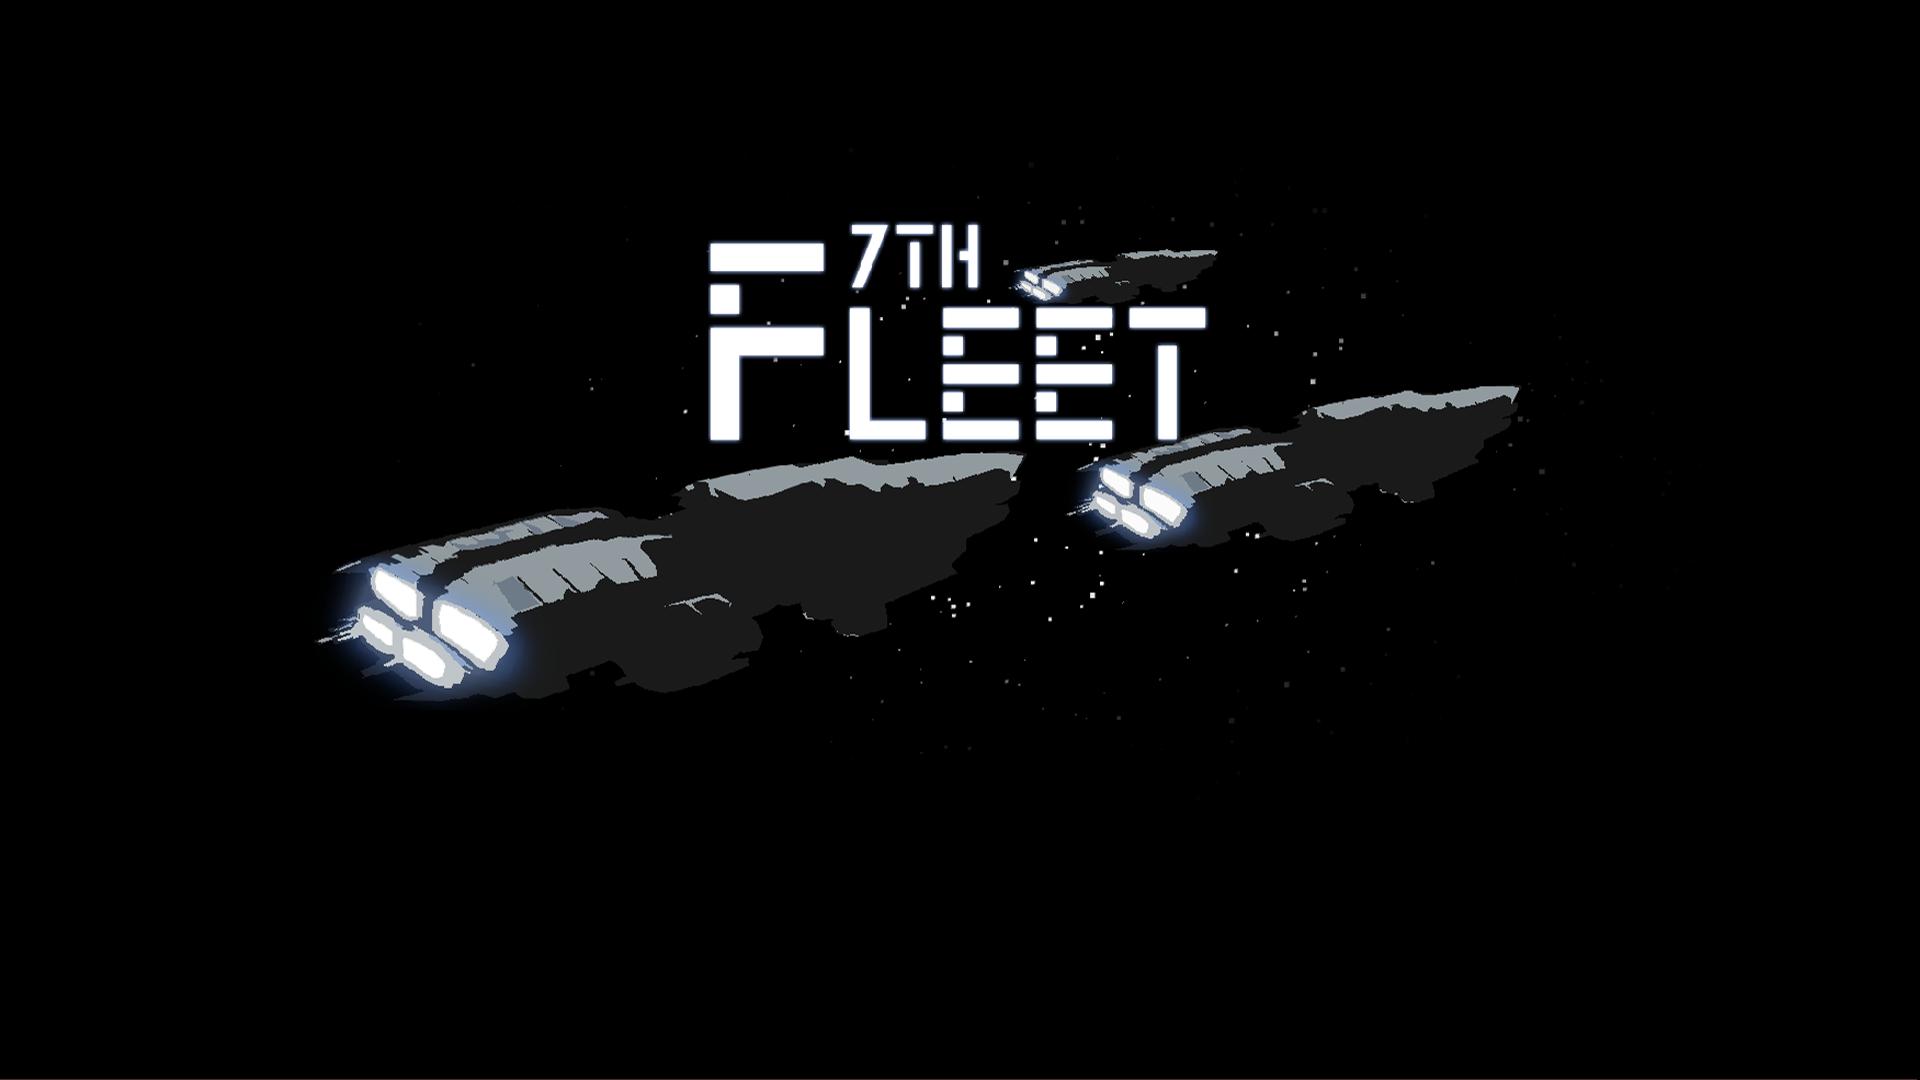 The 7th fleet (WIP)